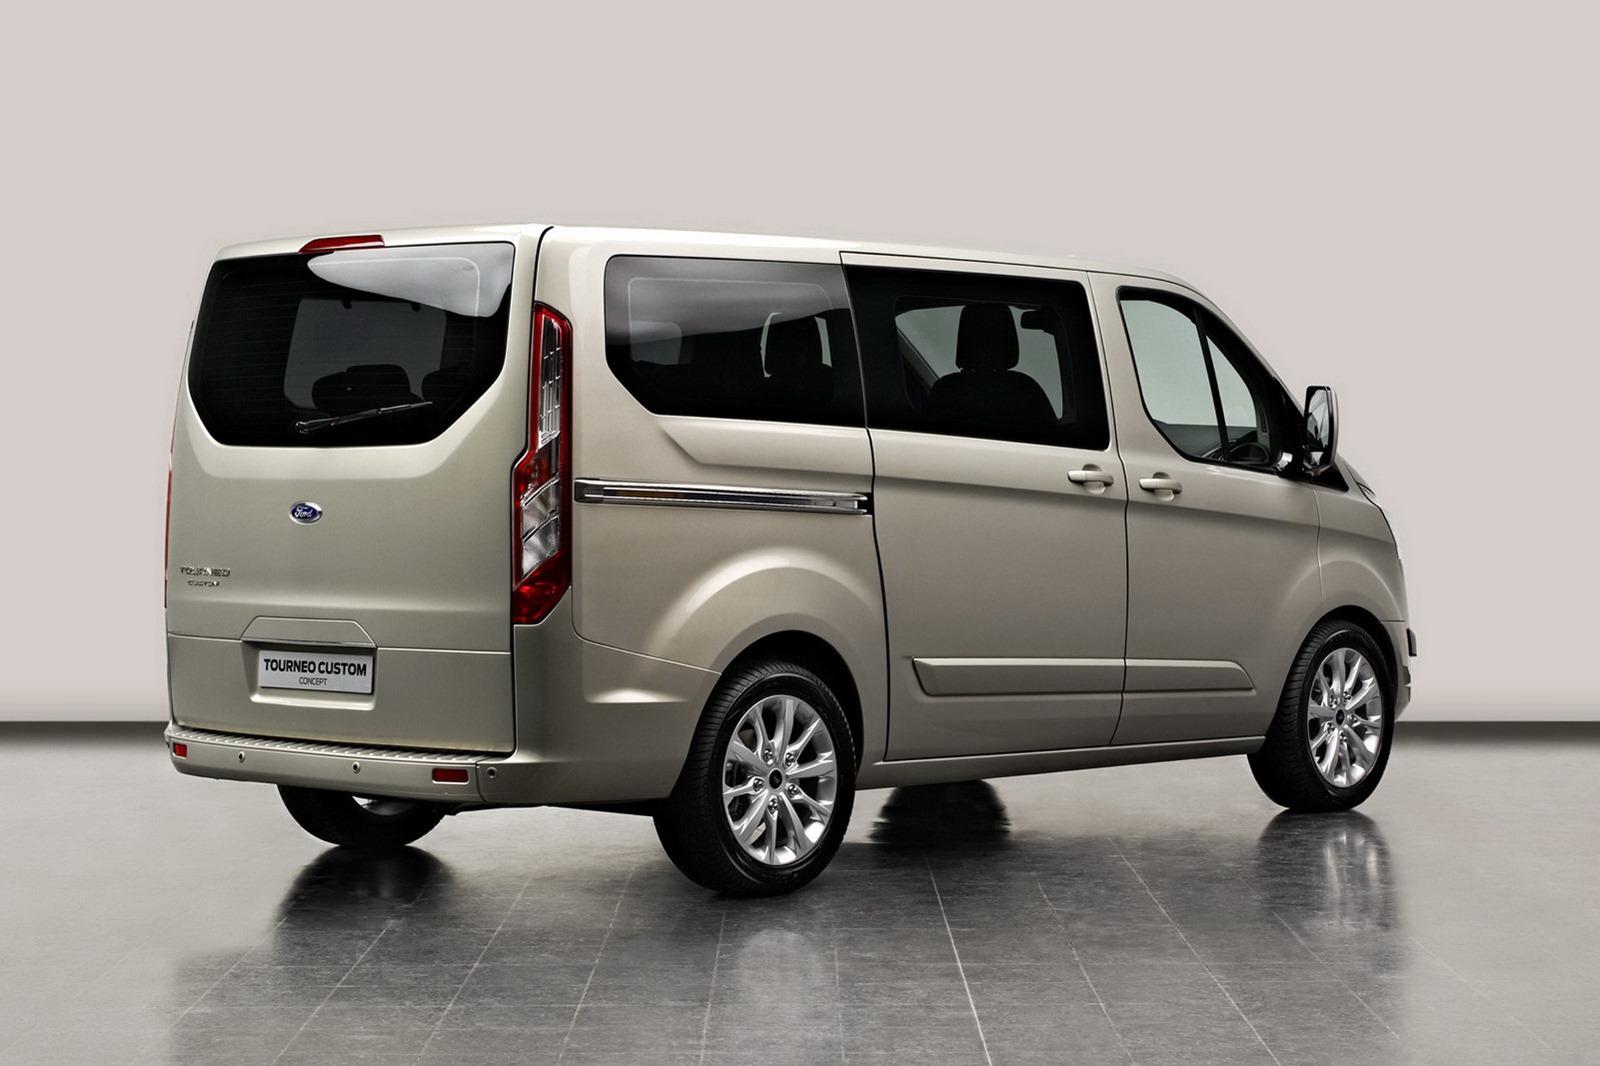 Ford Tourneo Van Concept